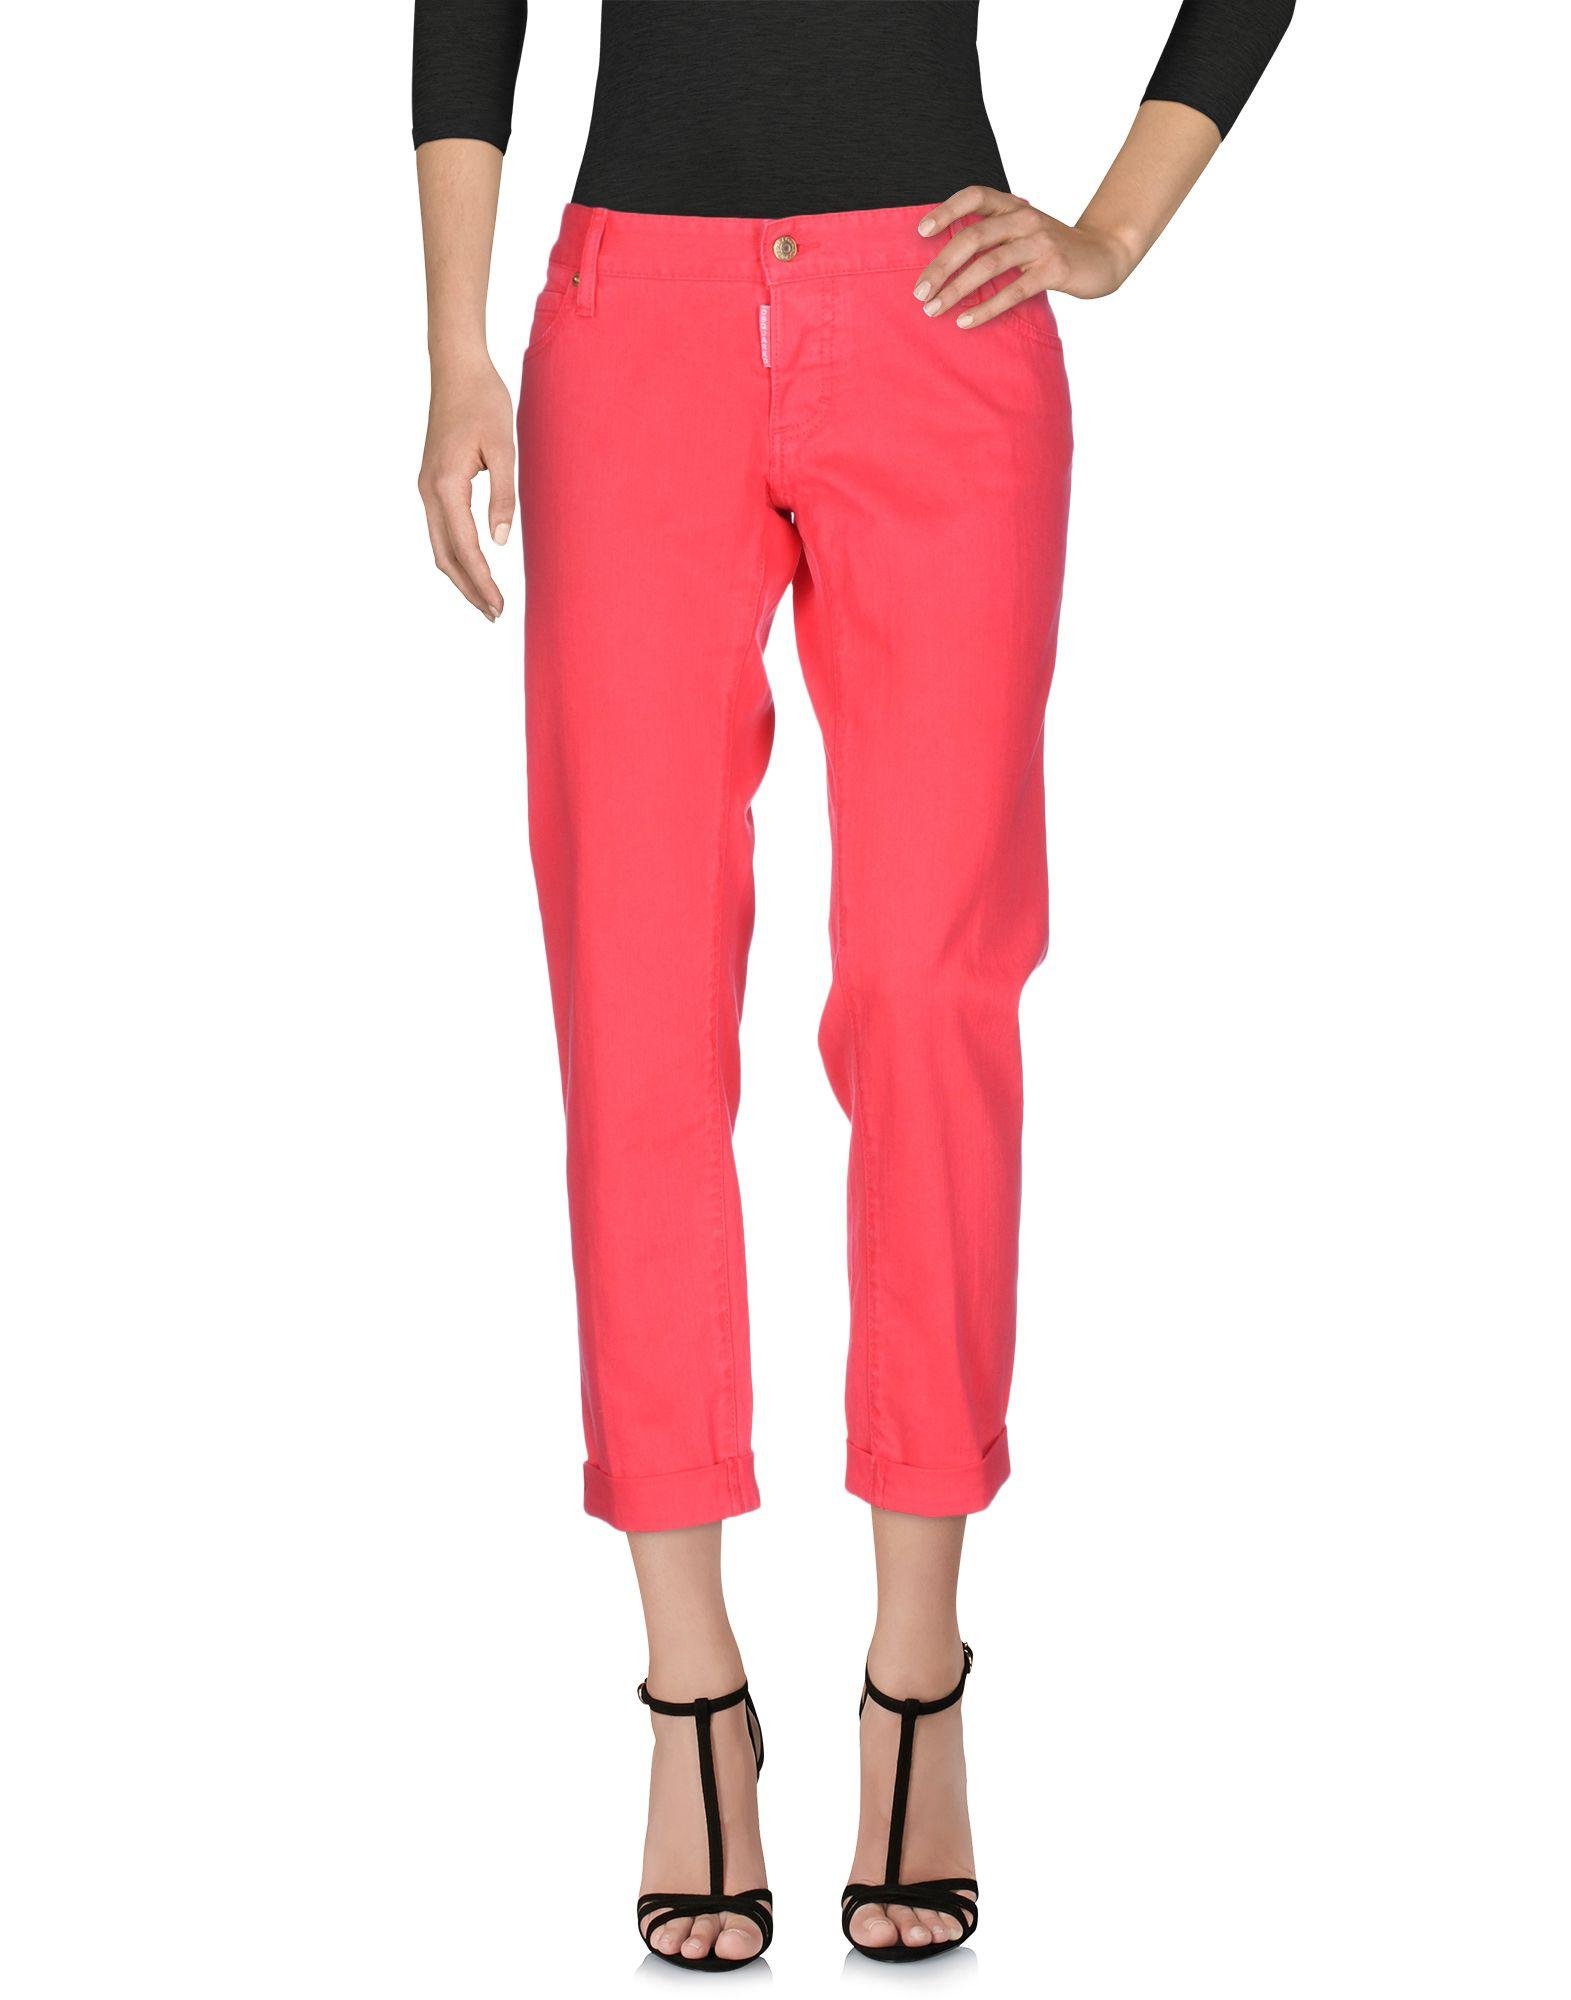 DSQUARED2 Damen Jeanshose Farbe Fuchsia Größe 6 jetztbilligerkaufen